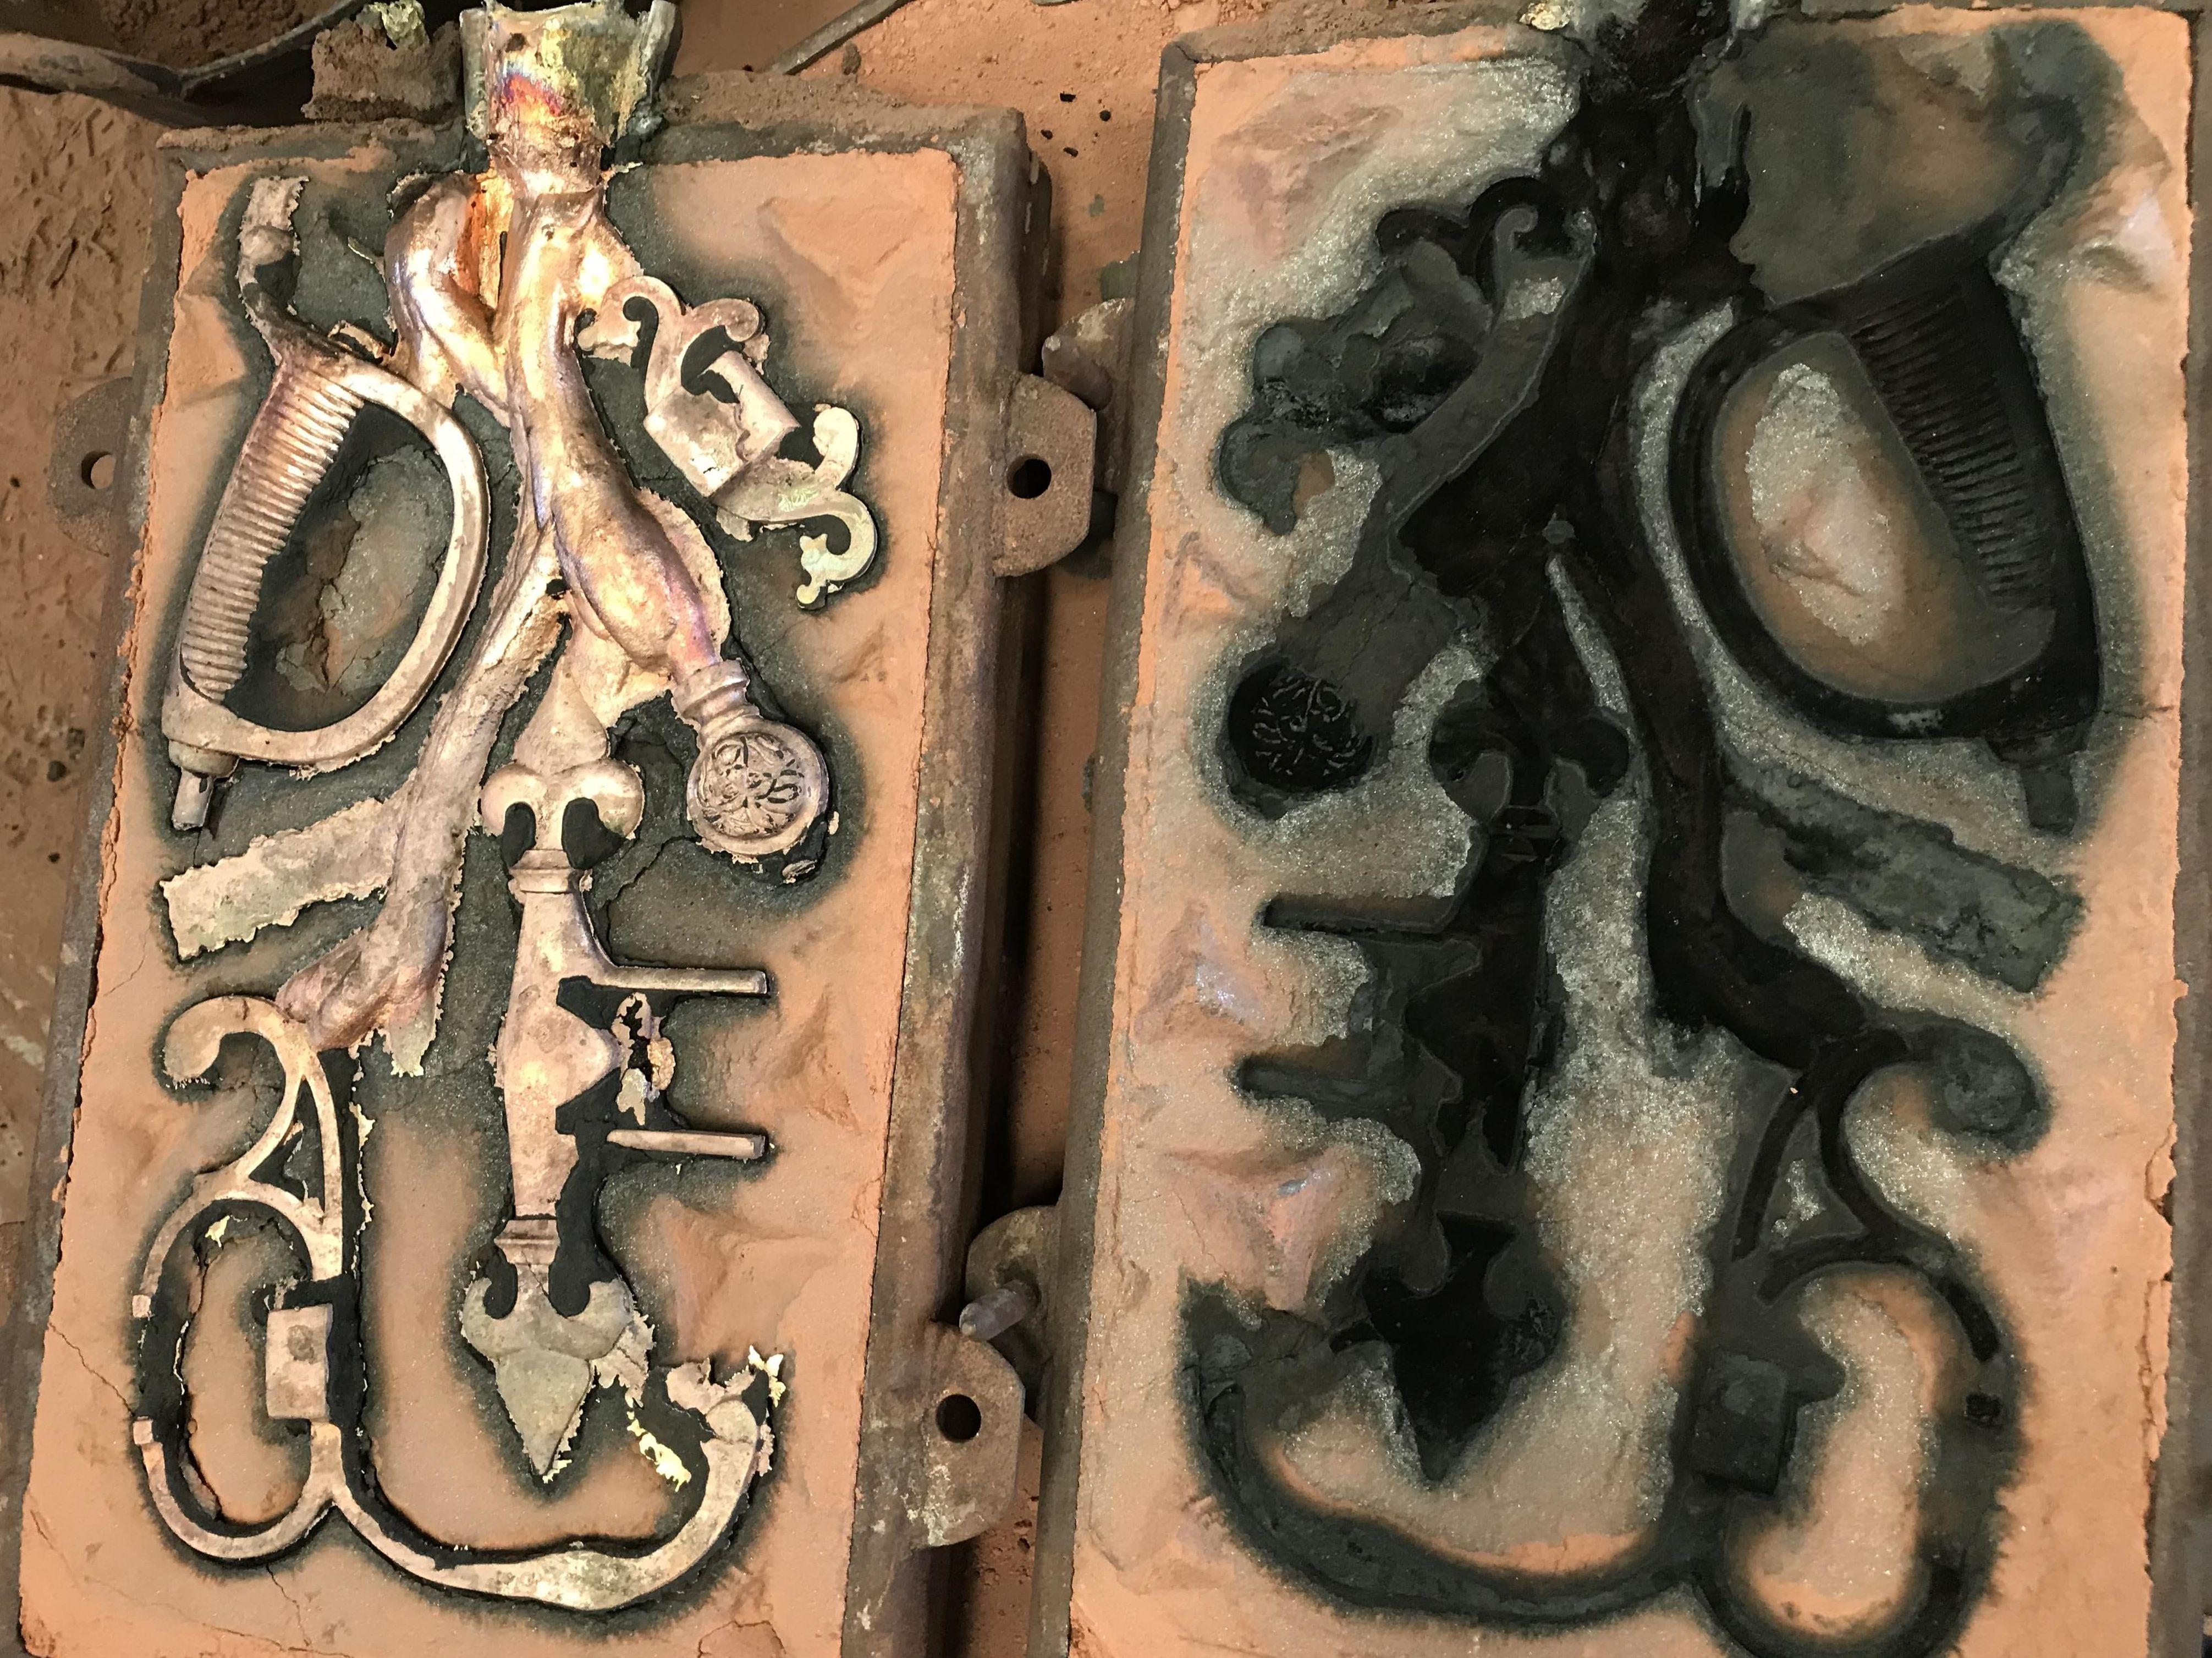 Empuñadura espada en molde de arena 1